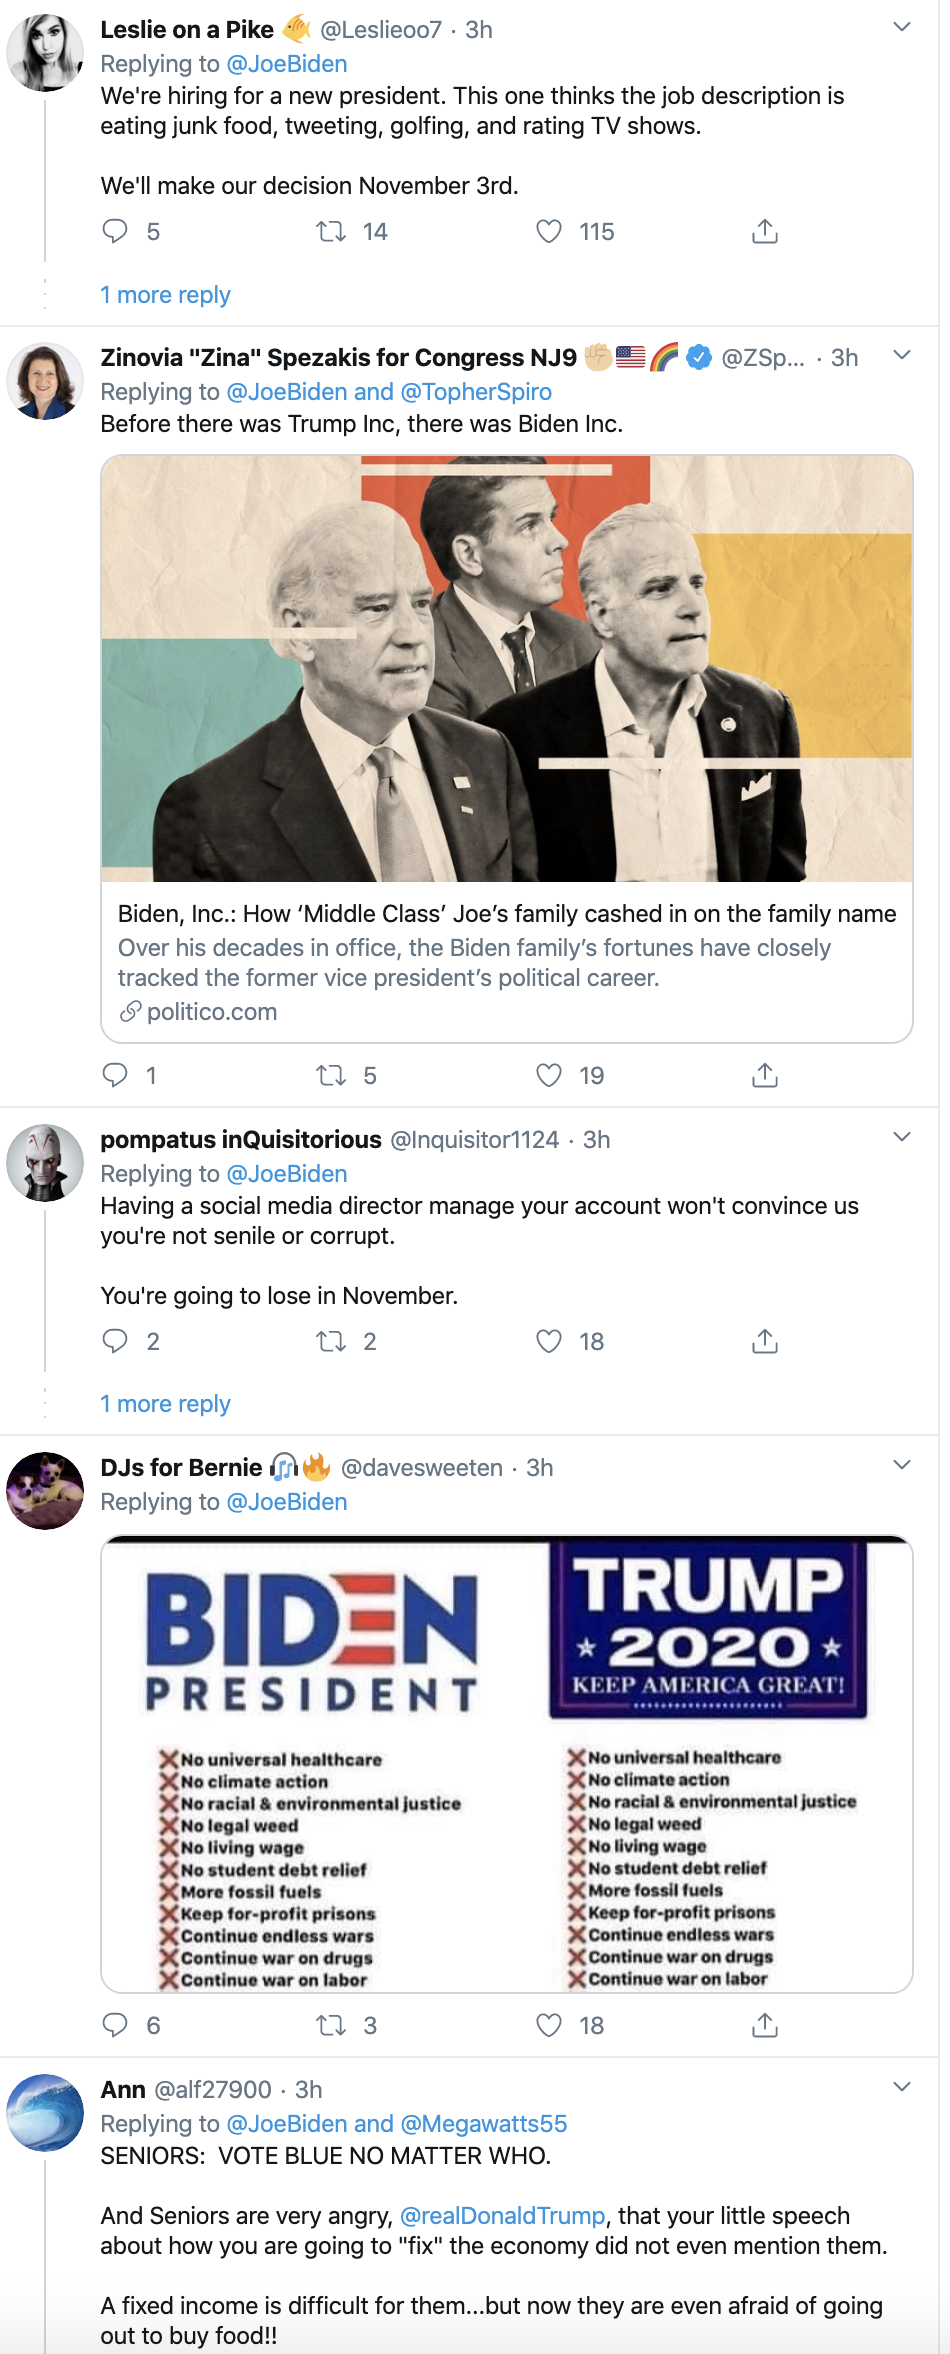 Screen-Shot-2020-03-10-at-12.39.12-PM Biden Trolls Trump Over Coronavirus & Goes Viral Fast Corruption Featured Healthcare Politics Top Stories